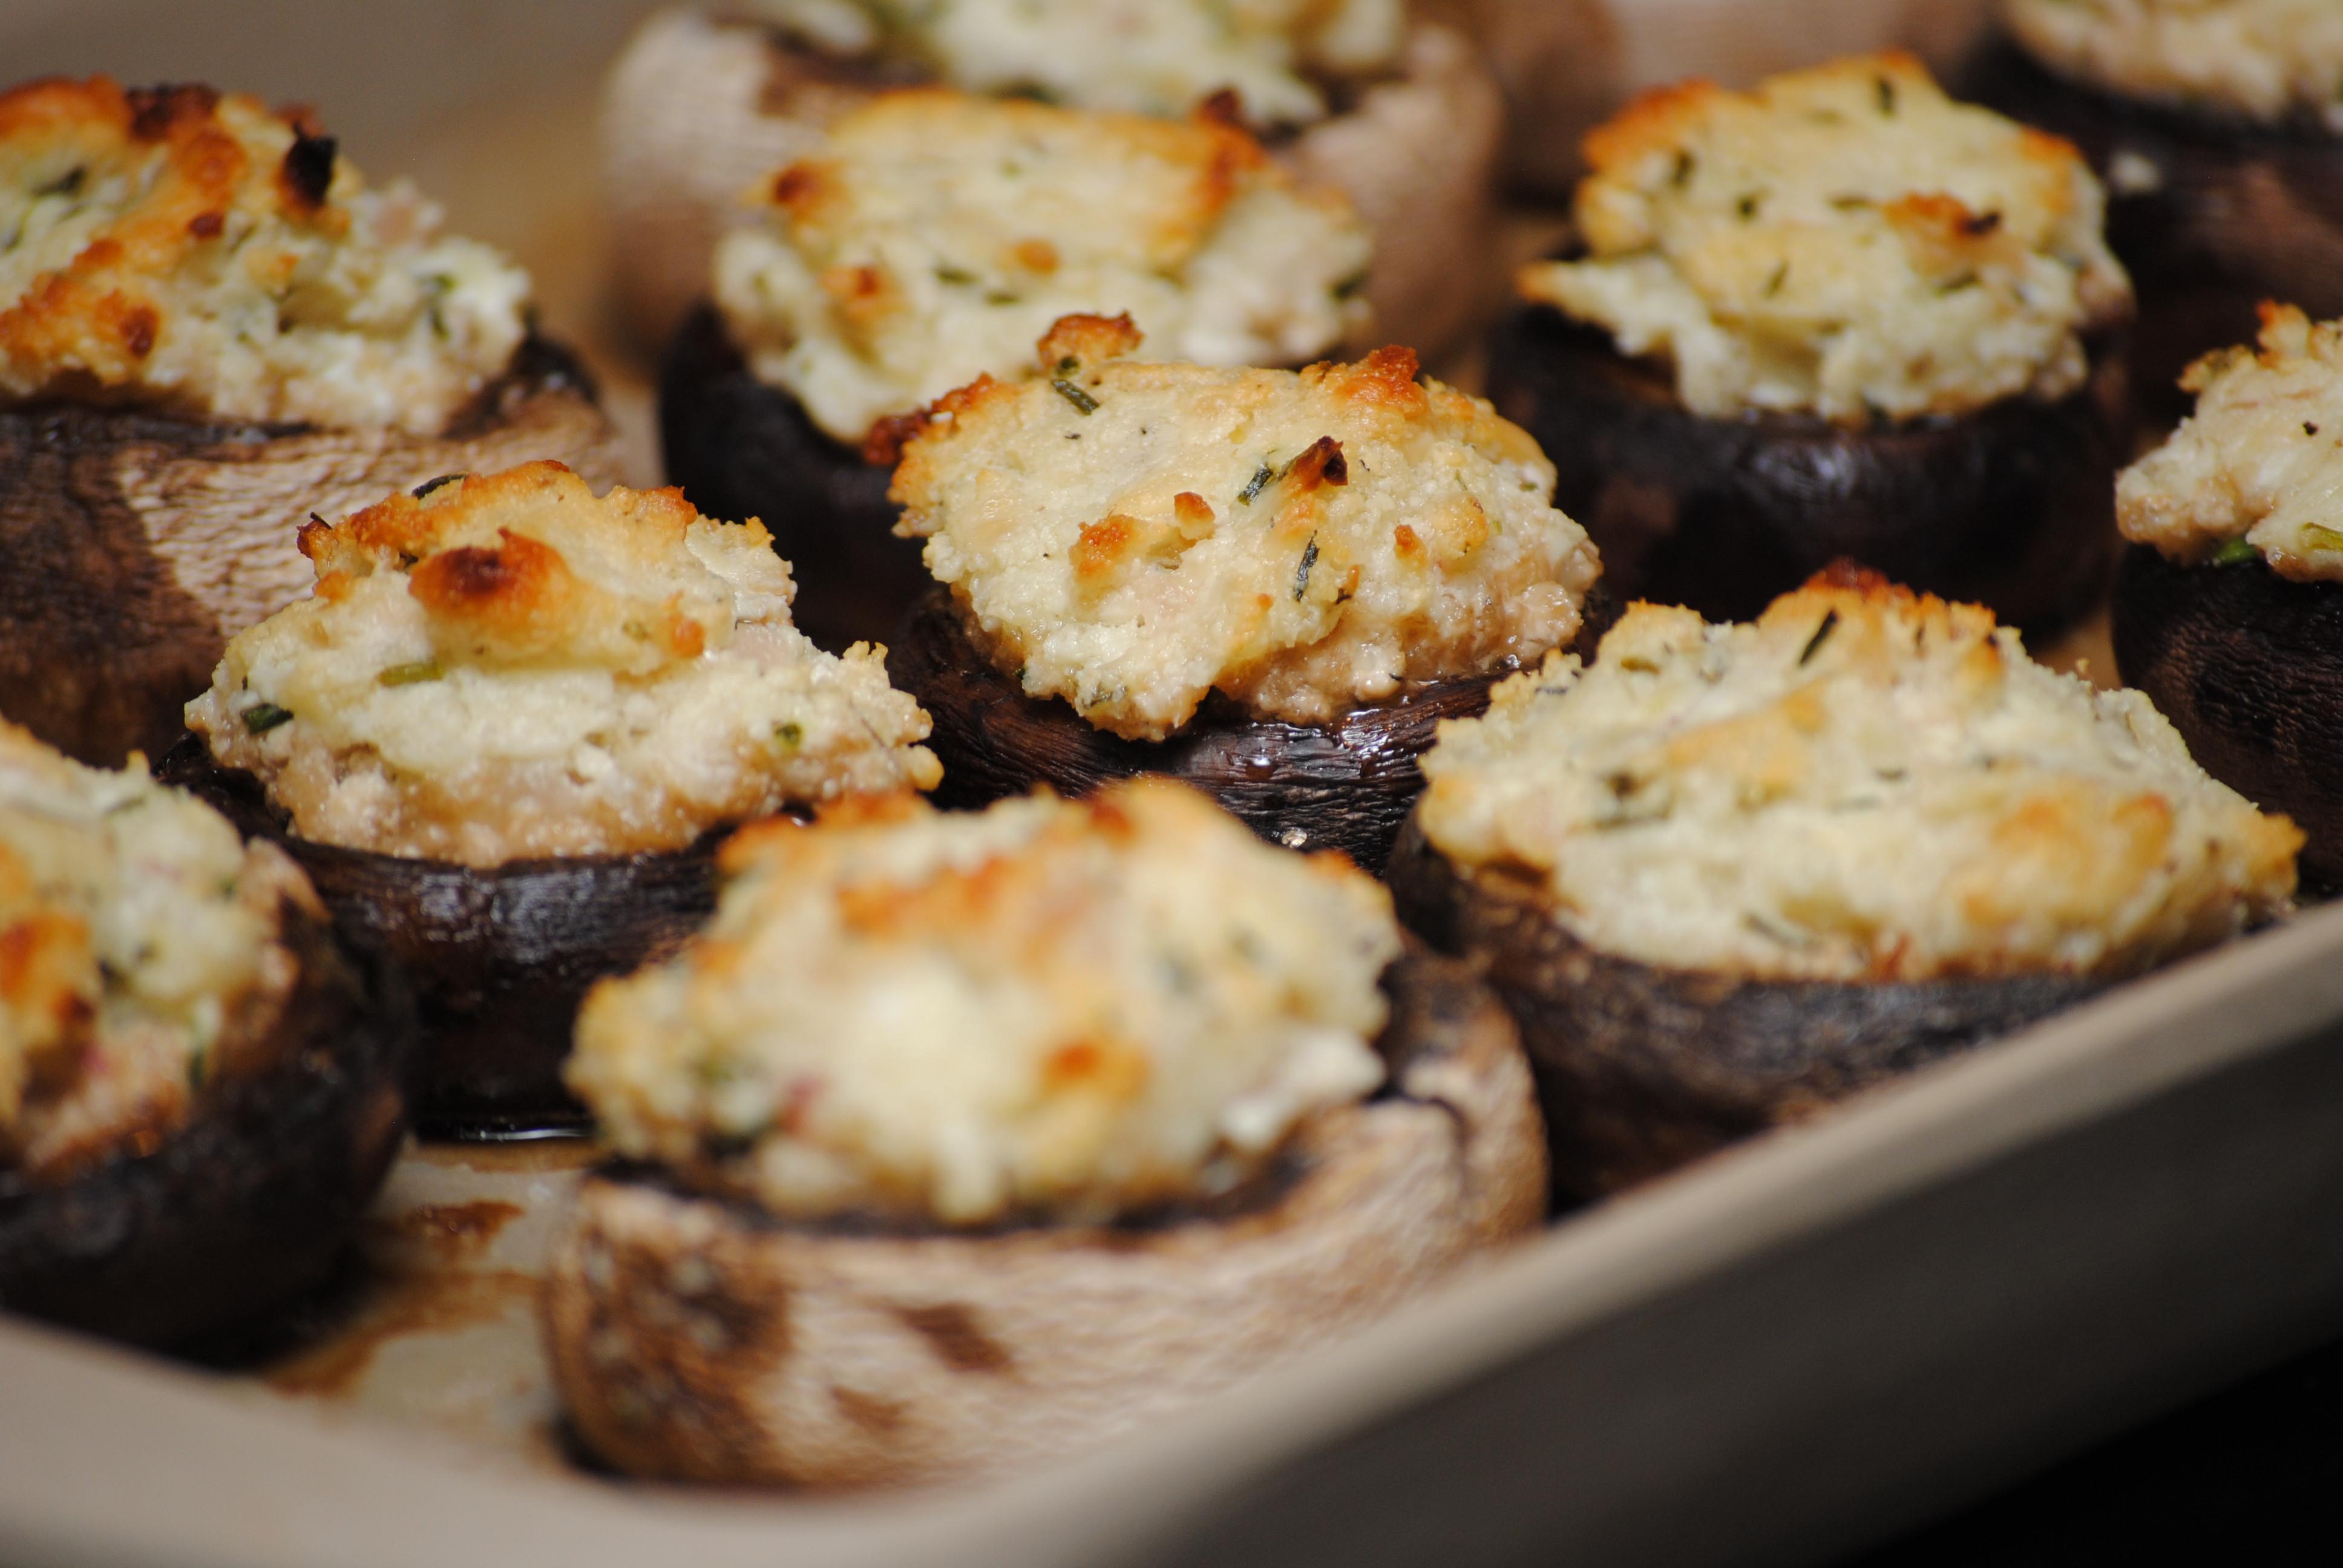 Cheese Stuffed Mushrooms  Goat Cheese and Herb Stuffed Mushrooms